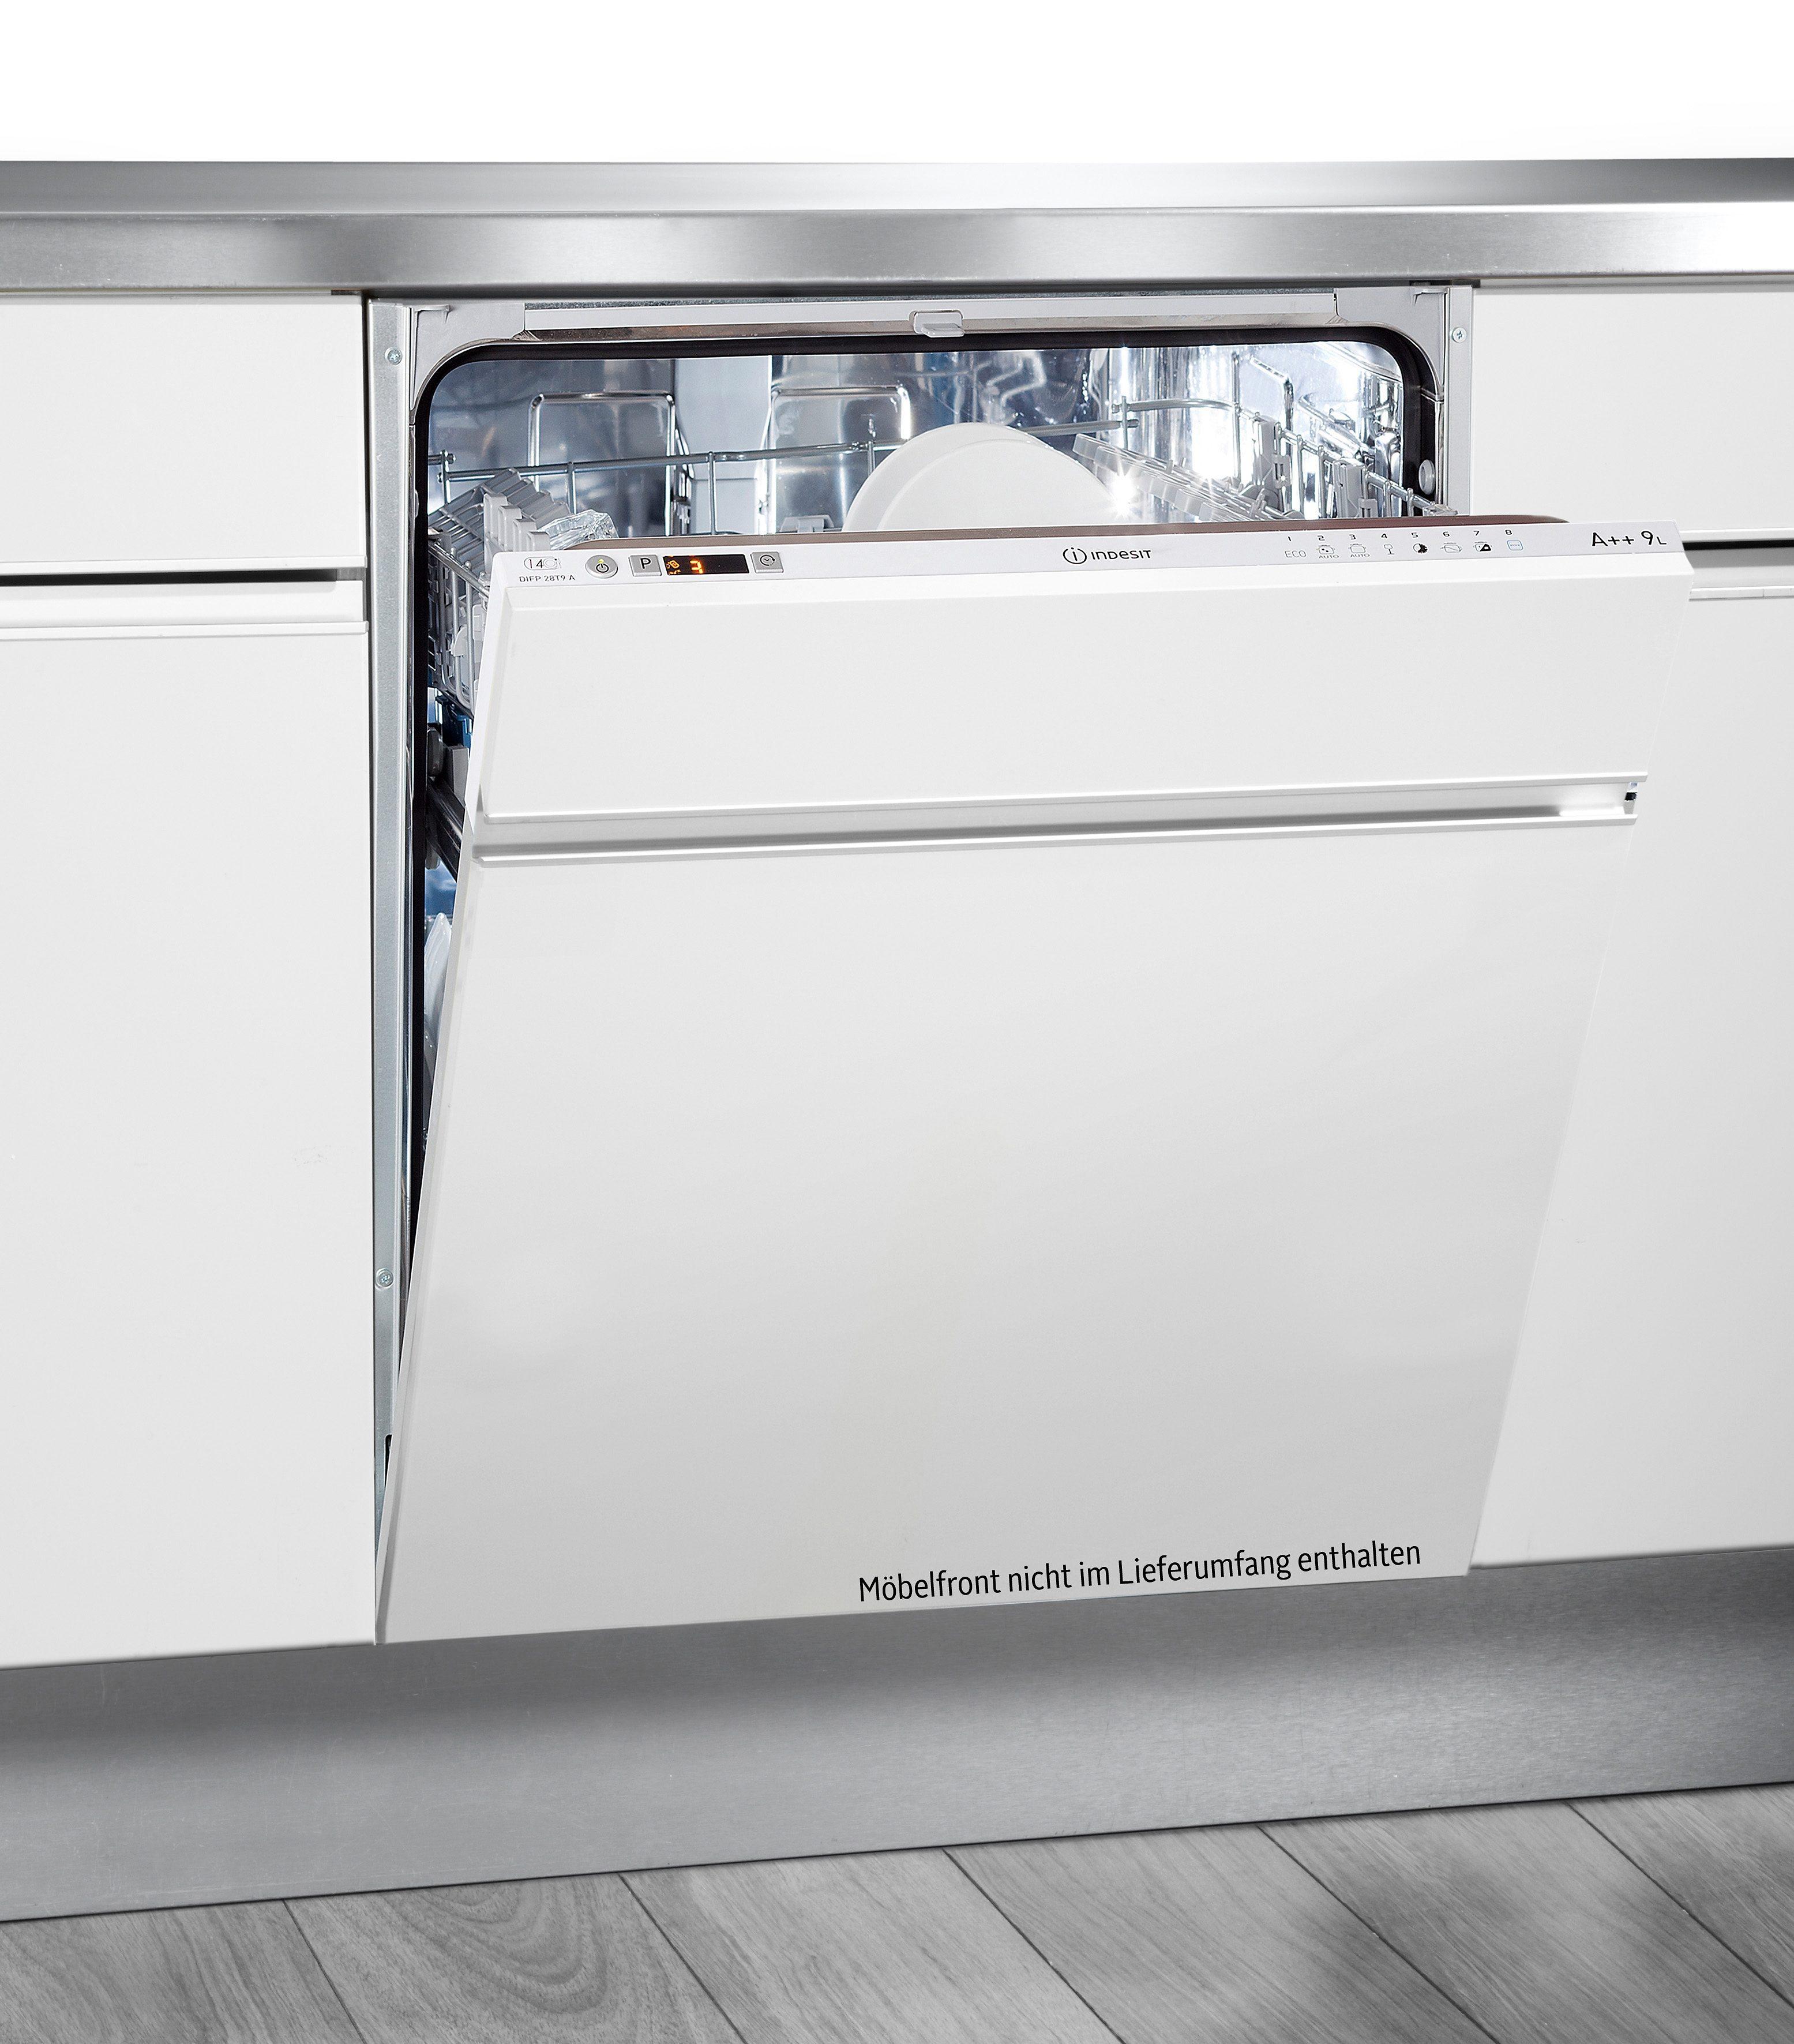 Indesit vollintegrierbarer Geschirrspüler, DIFP 28T9 A EU, 9 l, 14 Maßgedecke, Energieeffizienzklasse A++